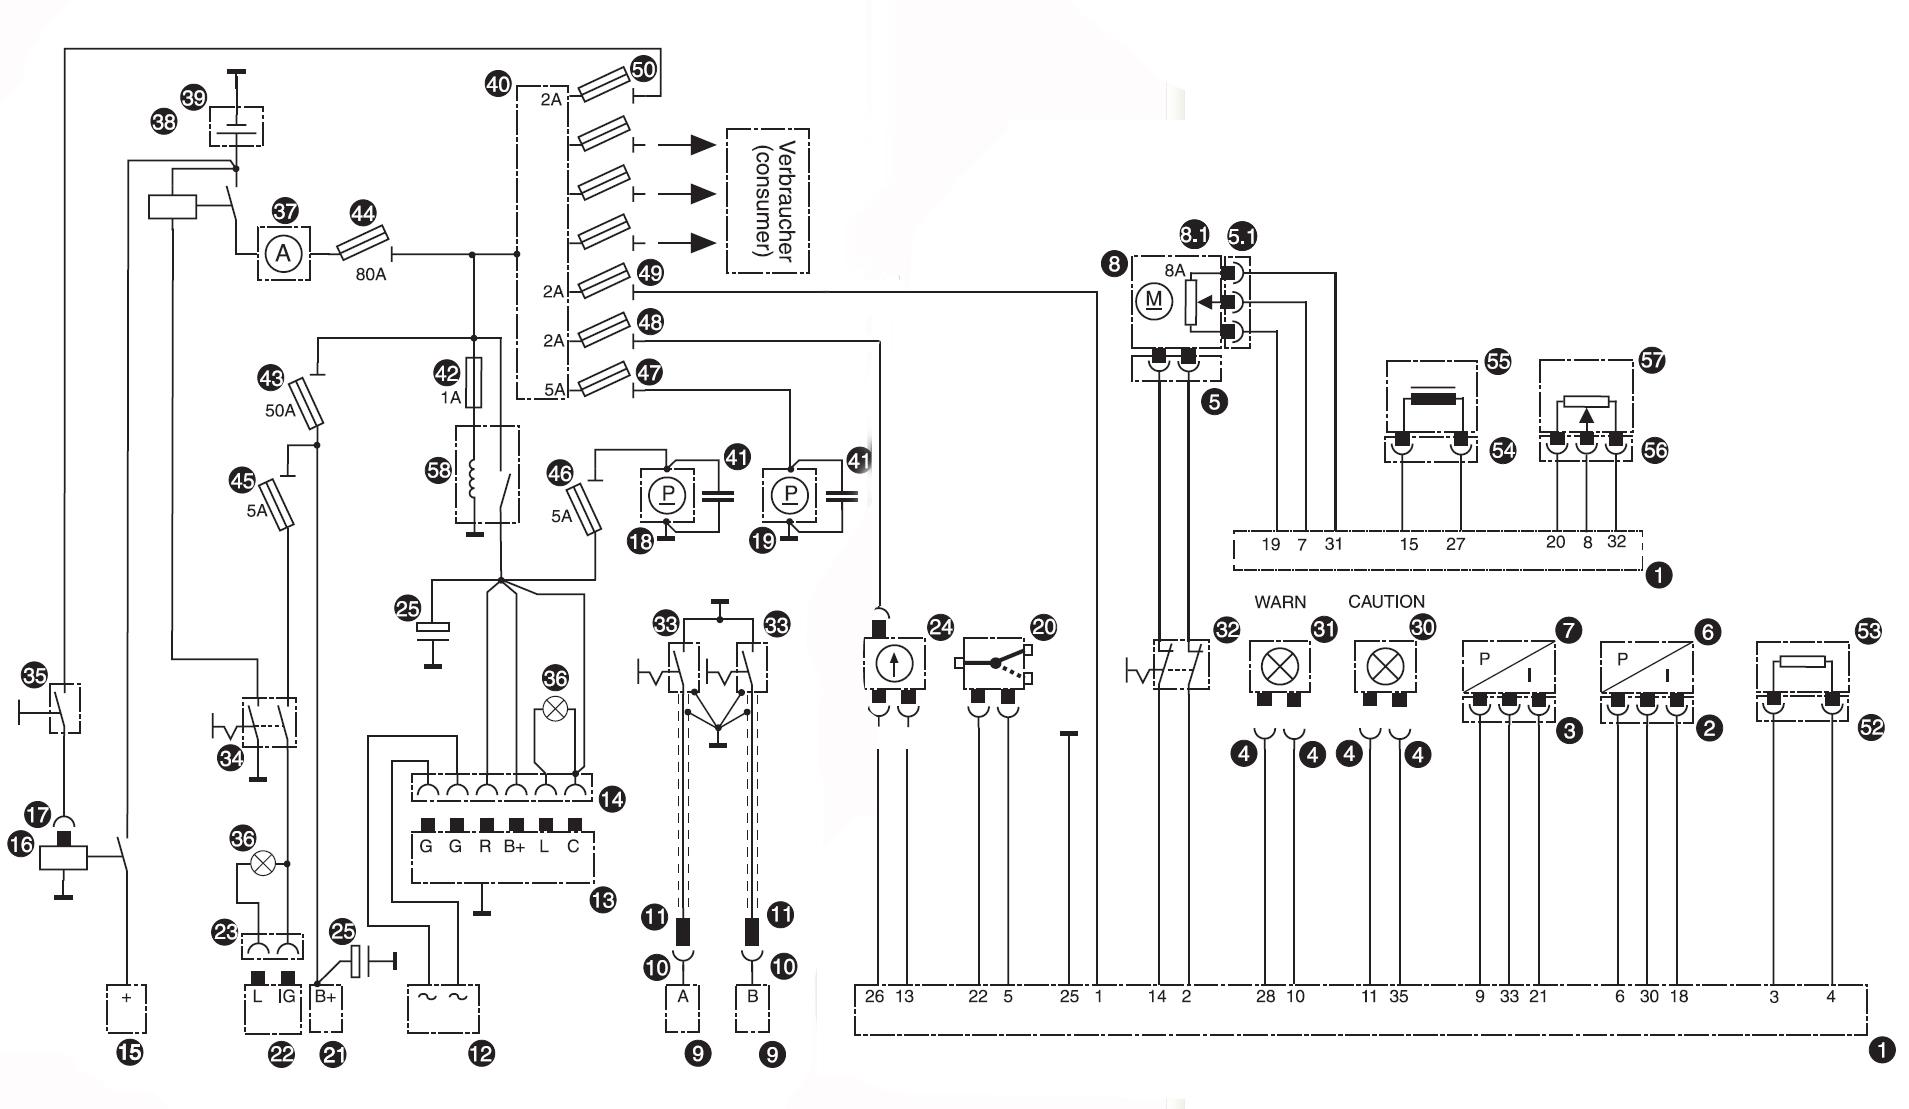 rotax wiring diagram wiring diagram 1986 Ski-Doo Safari Parts Diagram